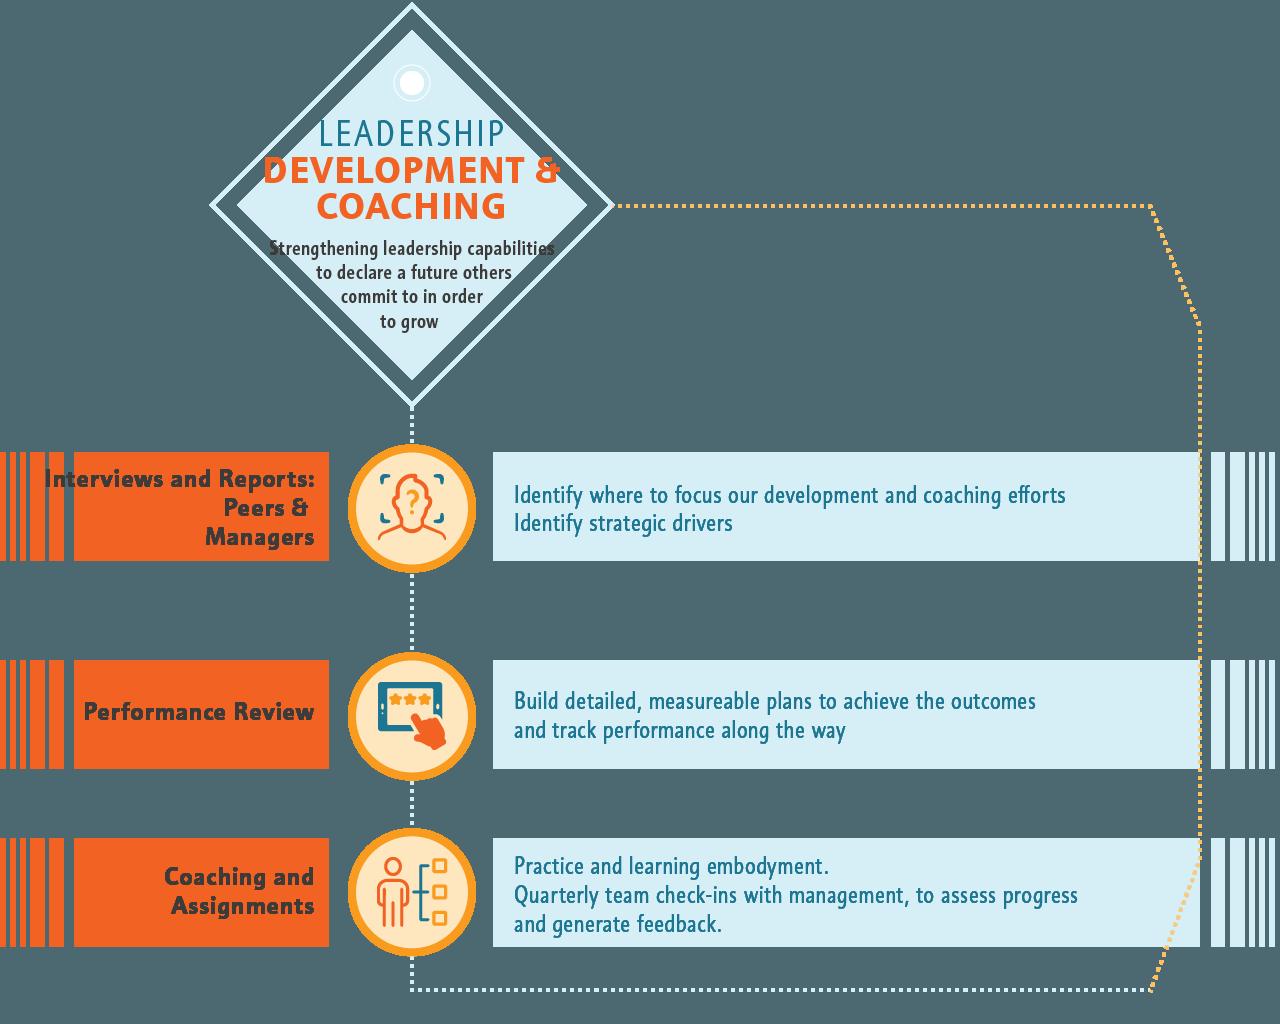 Leader Development ↦ Coaching